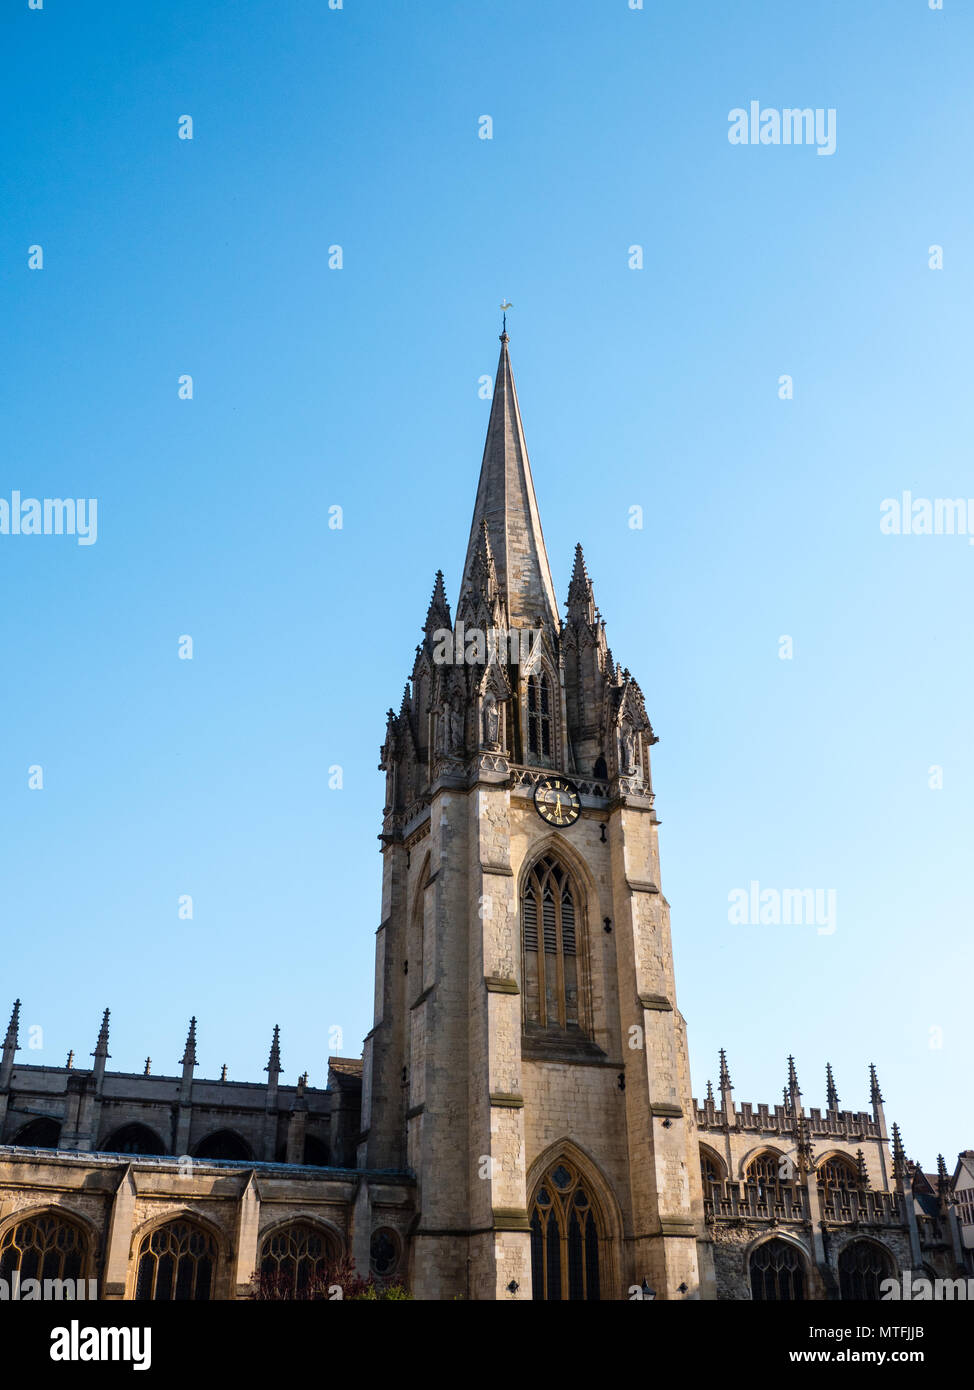 Universität Kirche St. Maria, der Jungfrau, Oxford, Oxfordshire, England, UK, GB. Stockbild